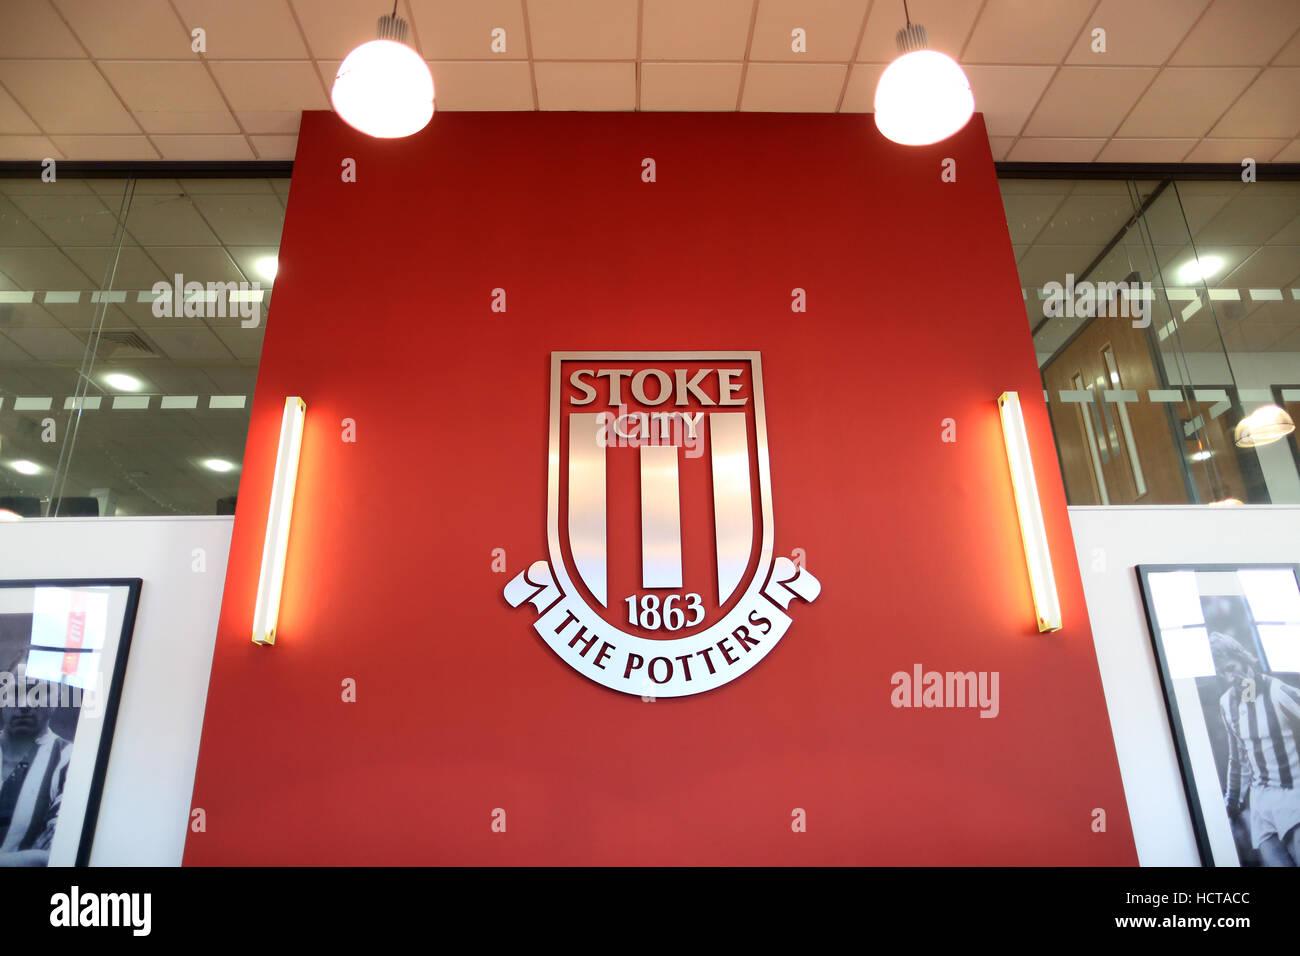 Reception area - Bet 365 Stadium - home to Stoke City FC - Stock Image